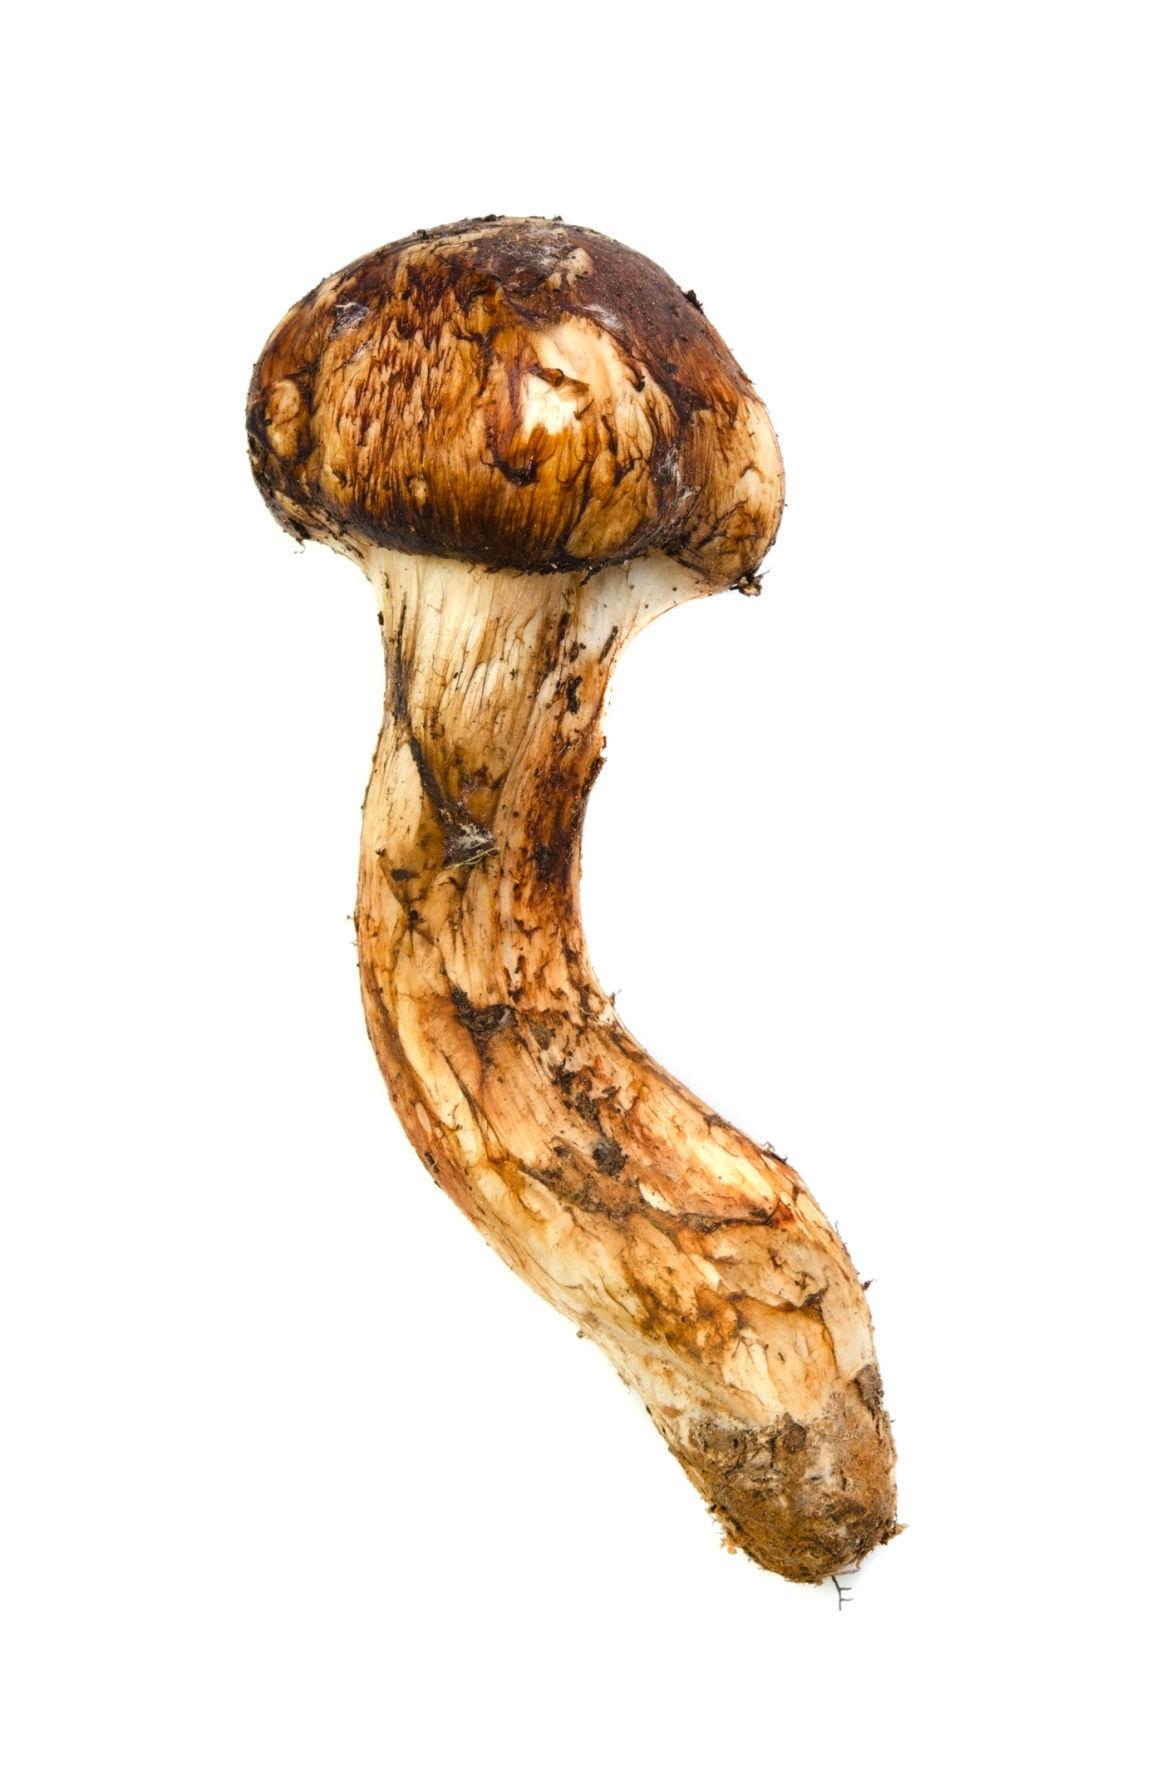 495671581Matsutake mushroom